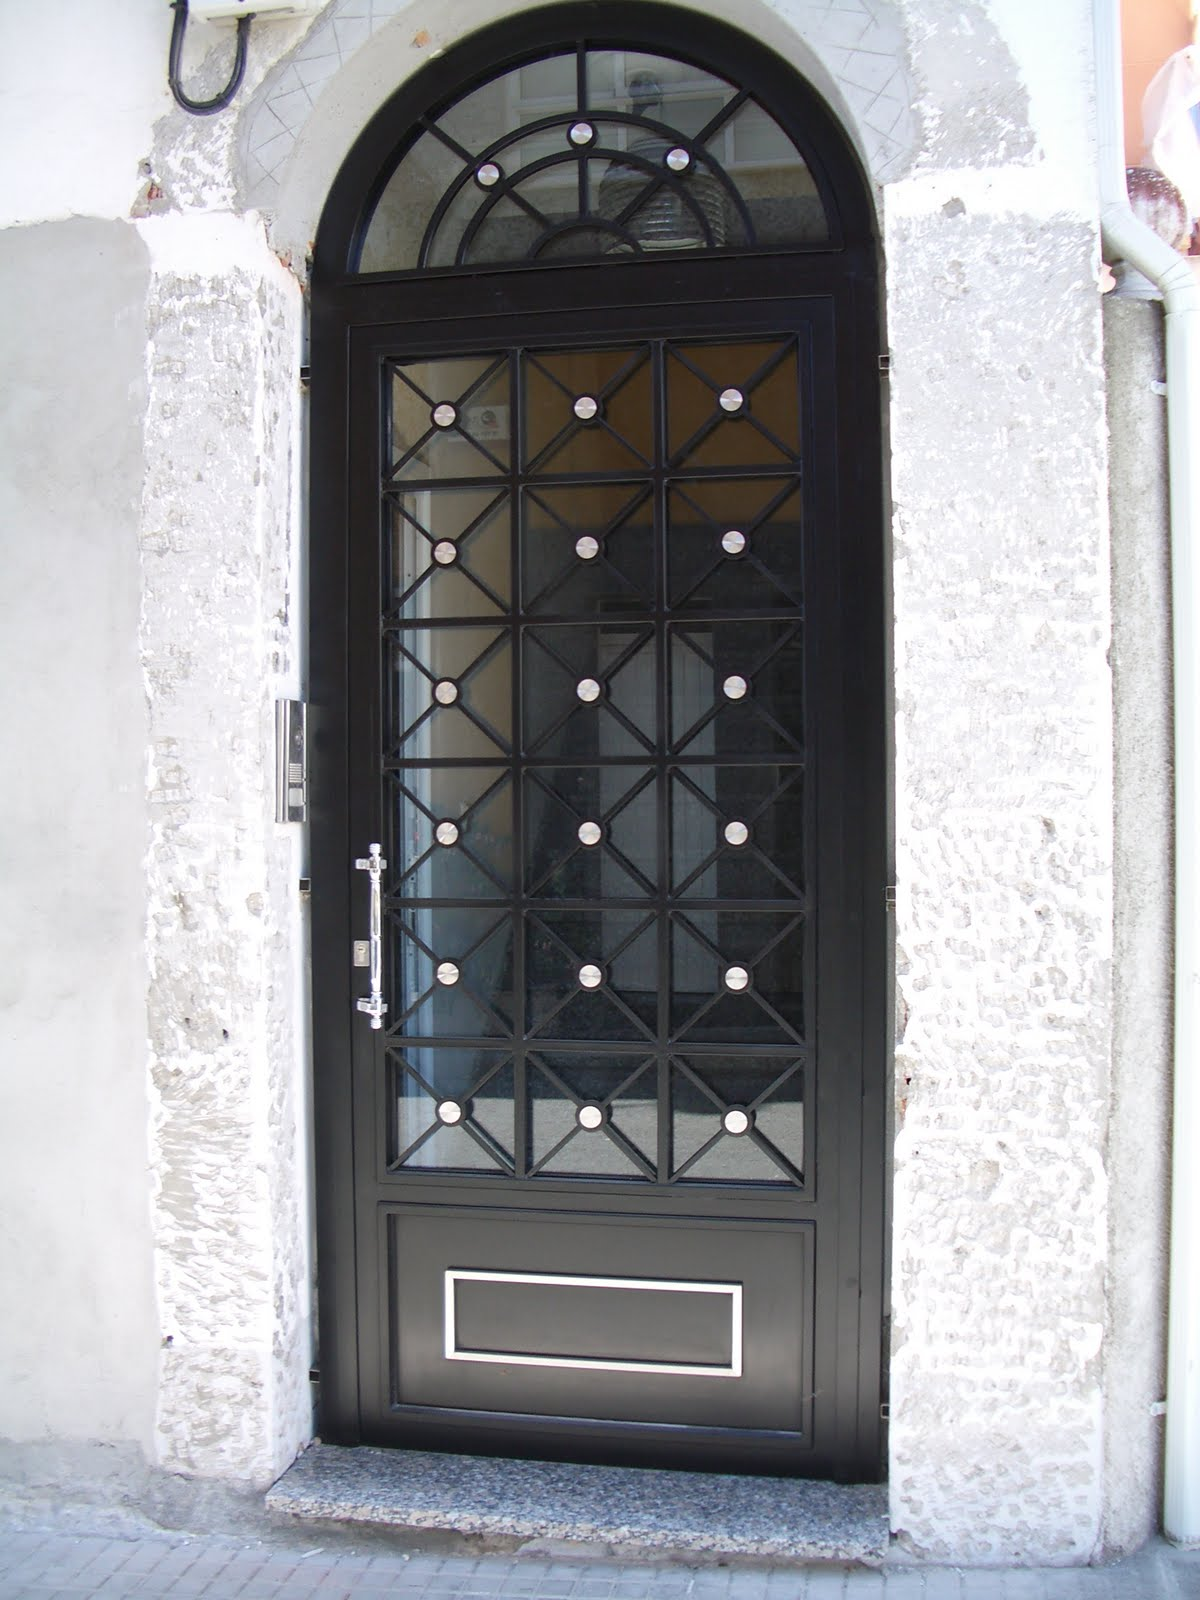 Talleres gra a s l puertas de forja a coru a for Modelos de puertas de hierro para casa